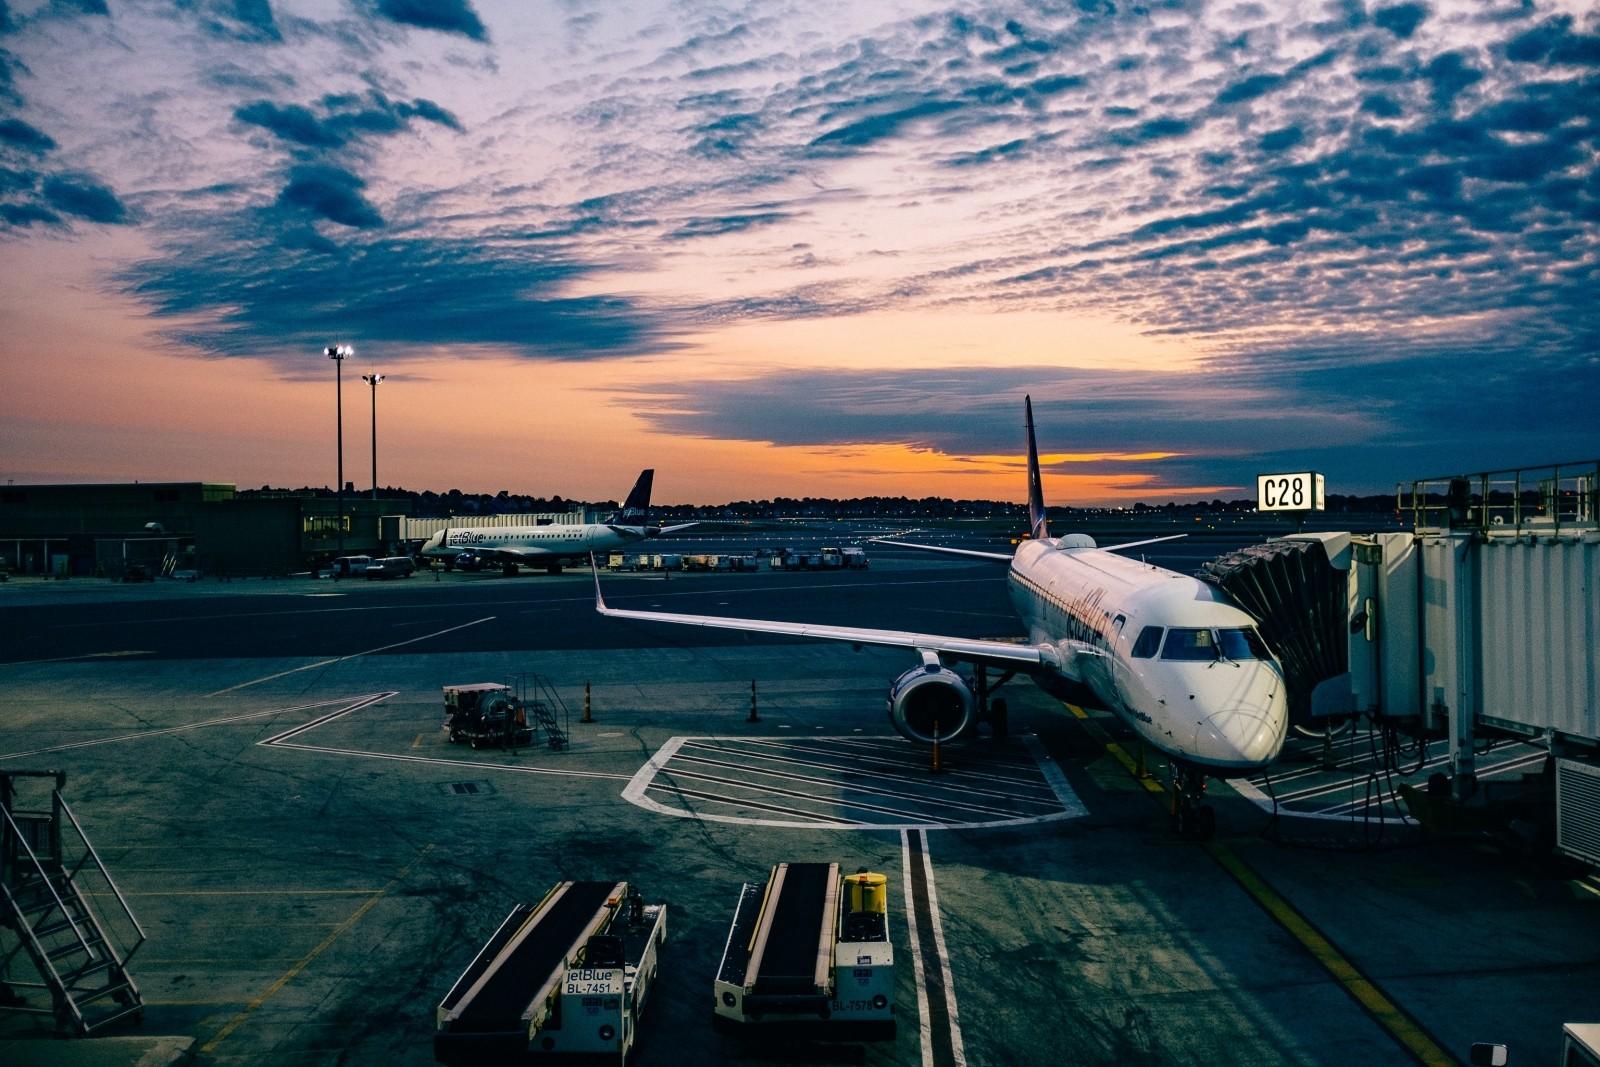 runway-travel-plane-jet-ski.jpg